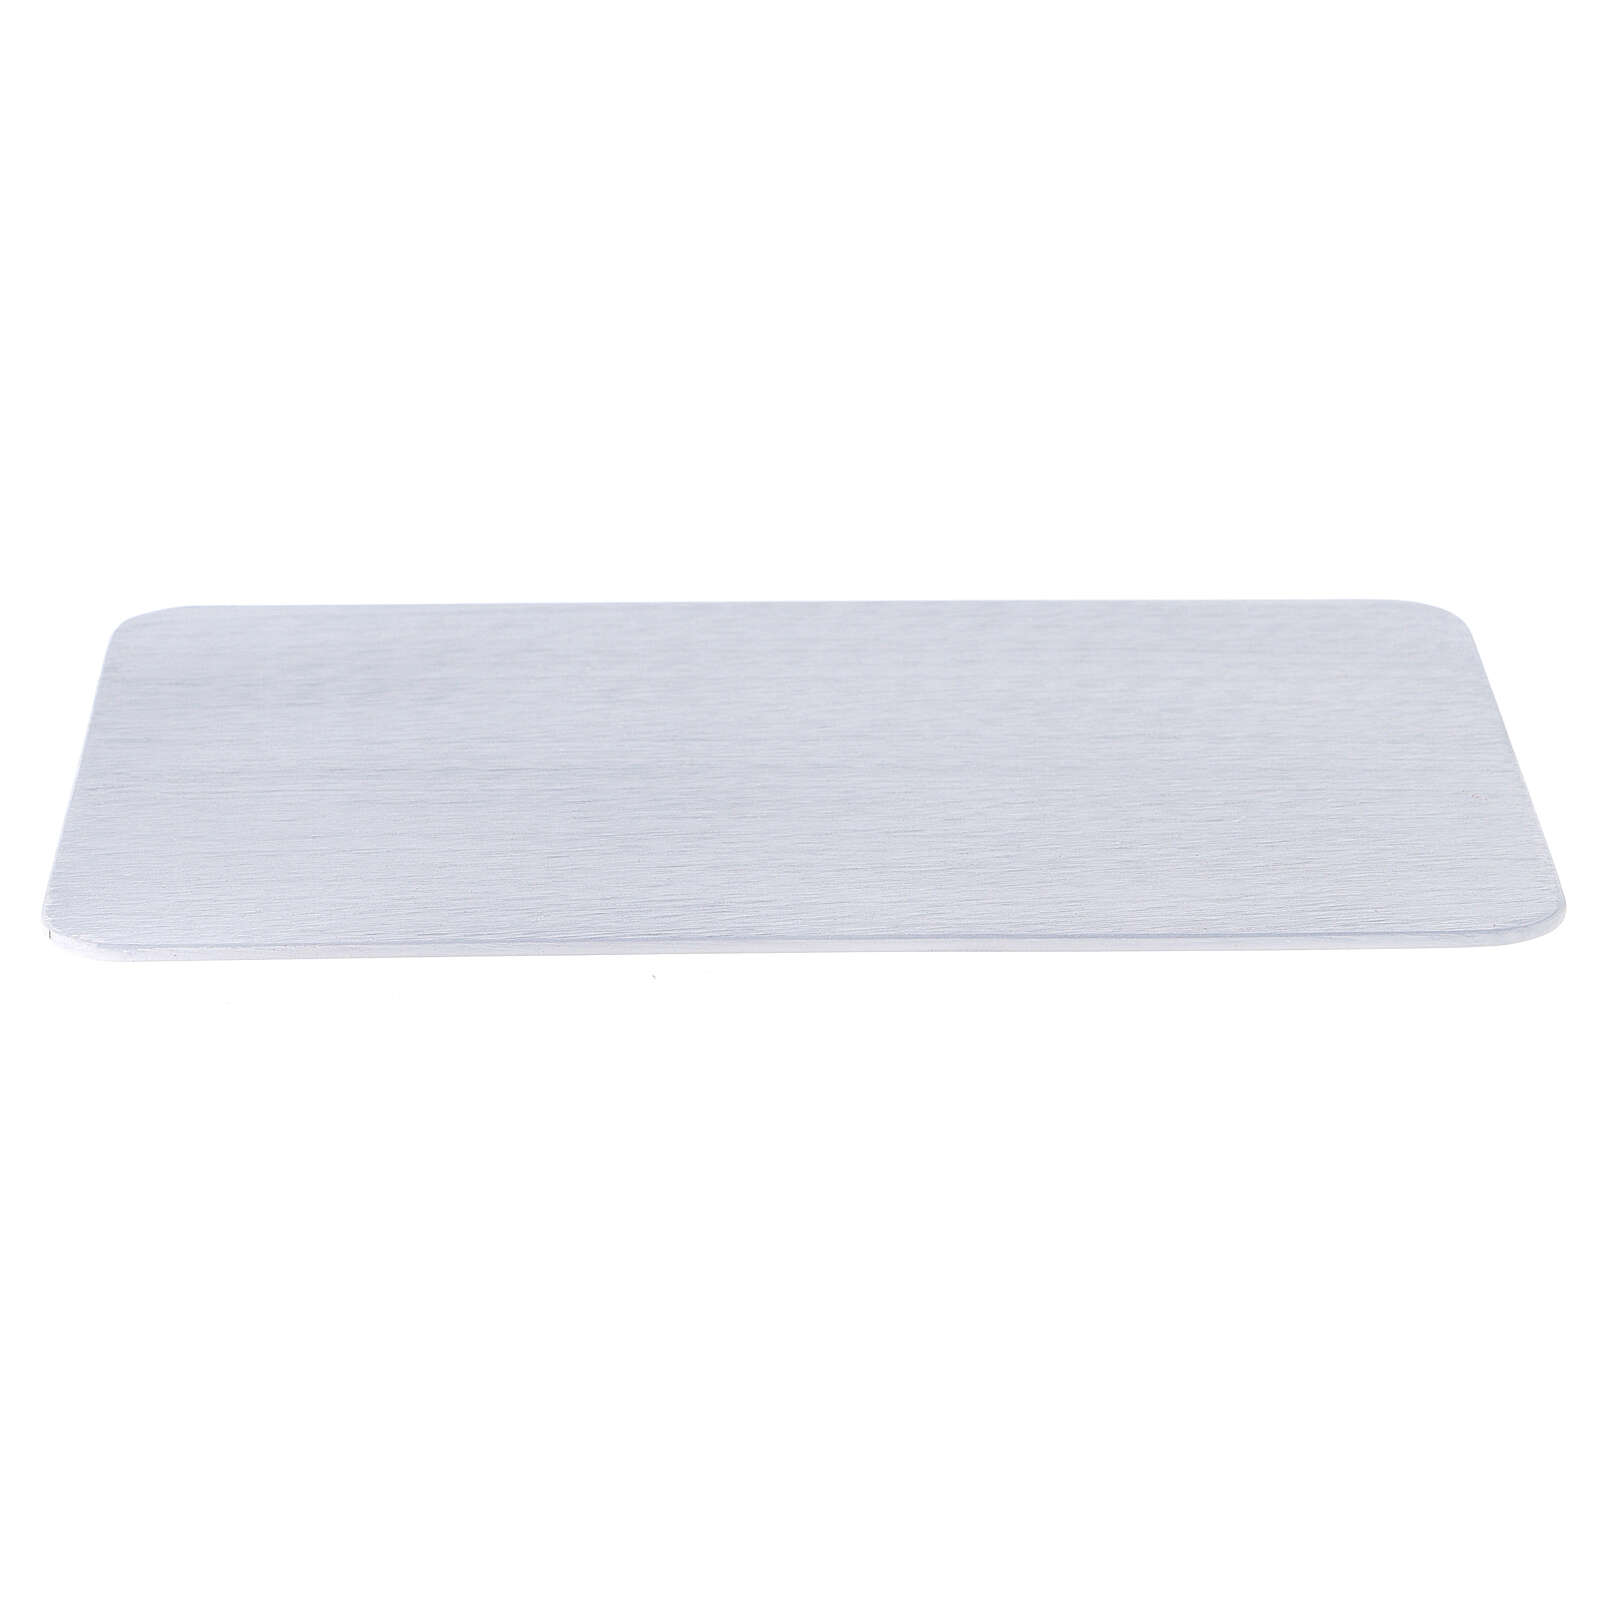 Plato portavela aluminio cepillado 20x14 cm rectangular 3